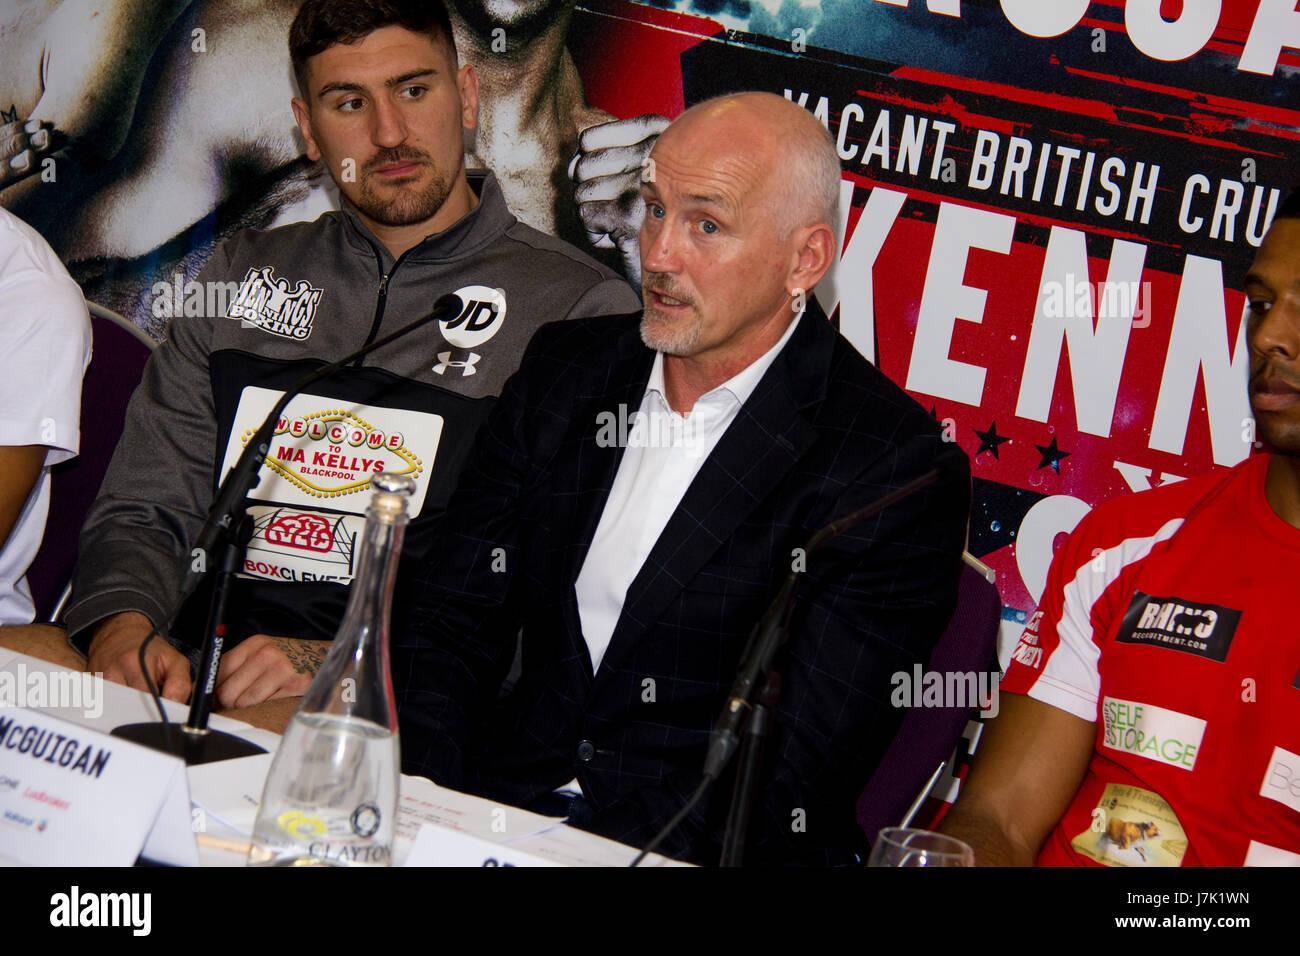 Geben Sie die Drachen Craig Kennedy V Matty Askin Andrew Selby V Cristofer Rosales Boxen Pressekonferenz Stockbild